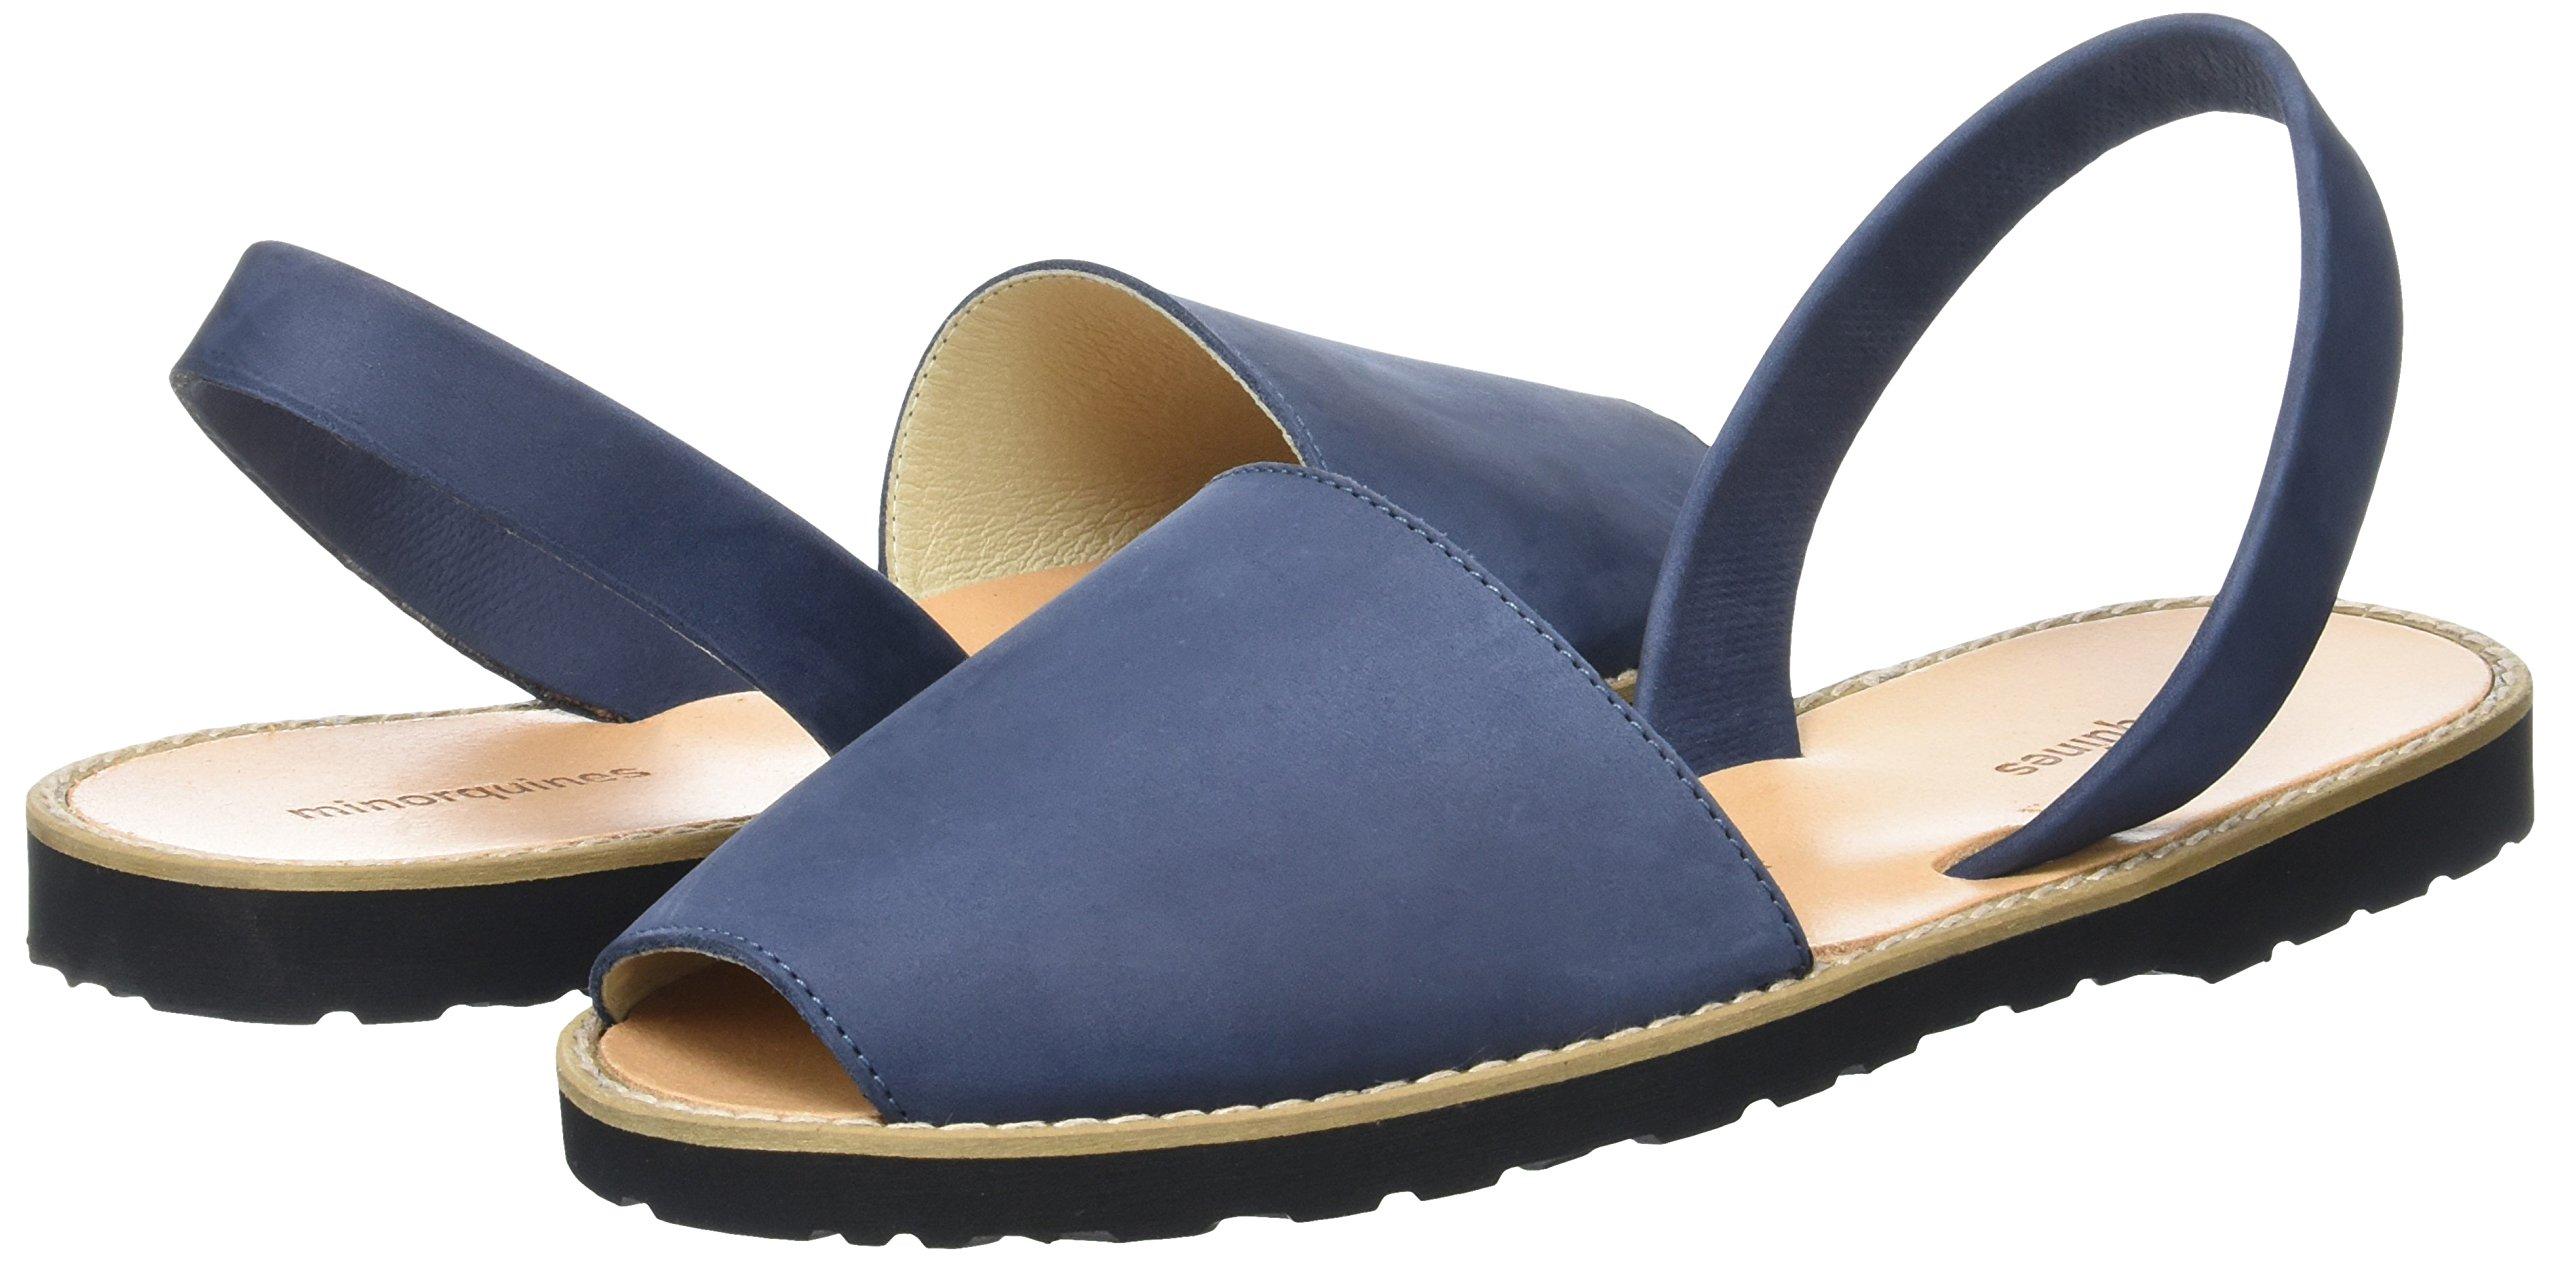 Minorquines Men S Avarca Sling Back Sandals Buy Online In Cayman Islands At Cayman Desertcart Com Productid 190808511